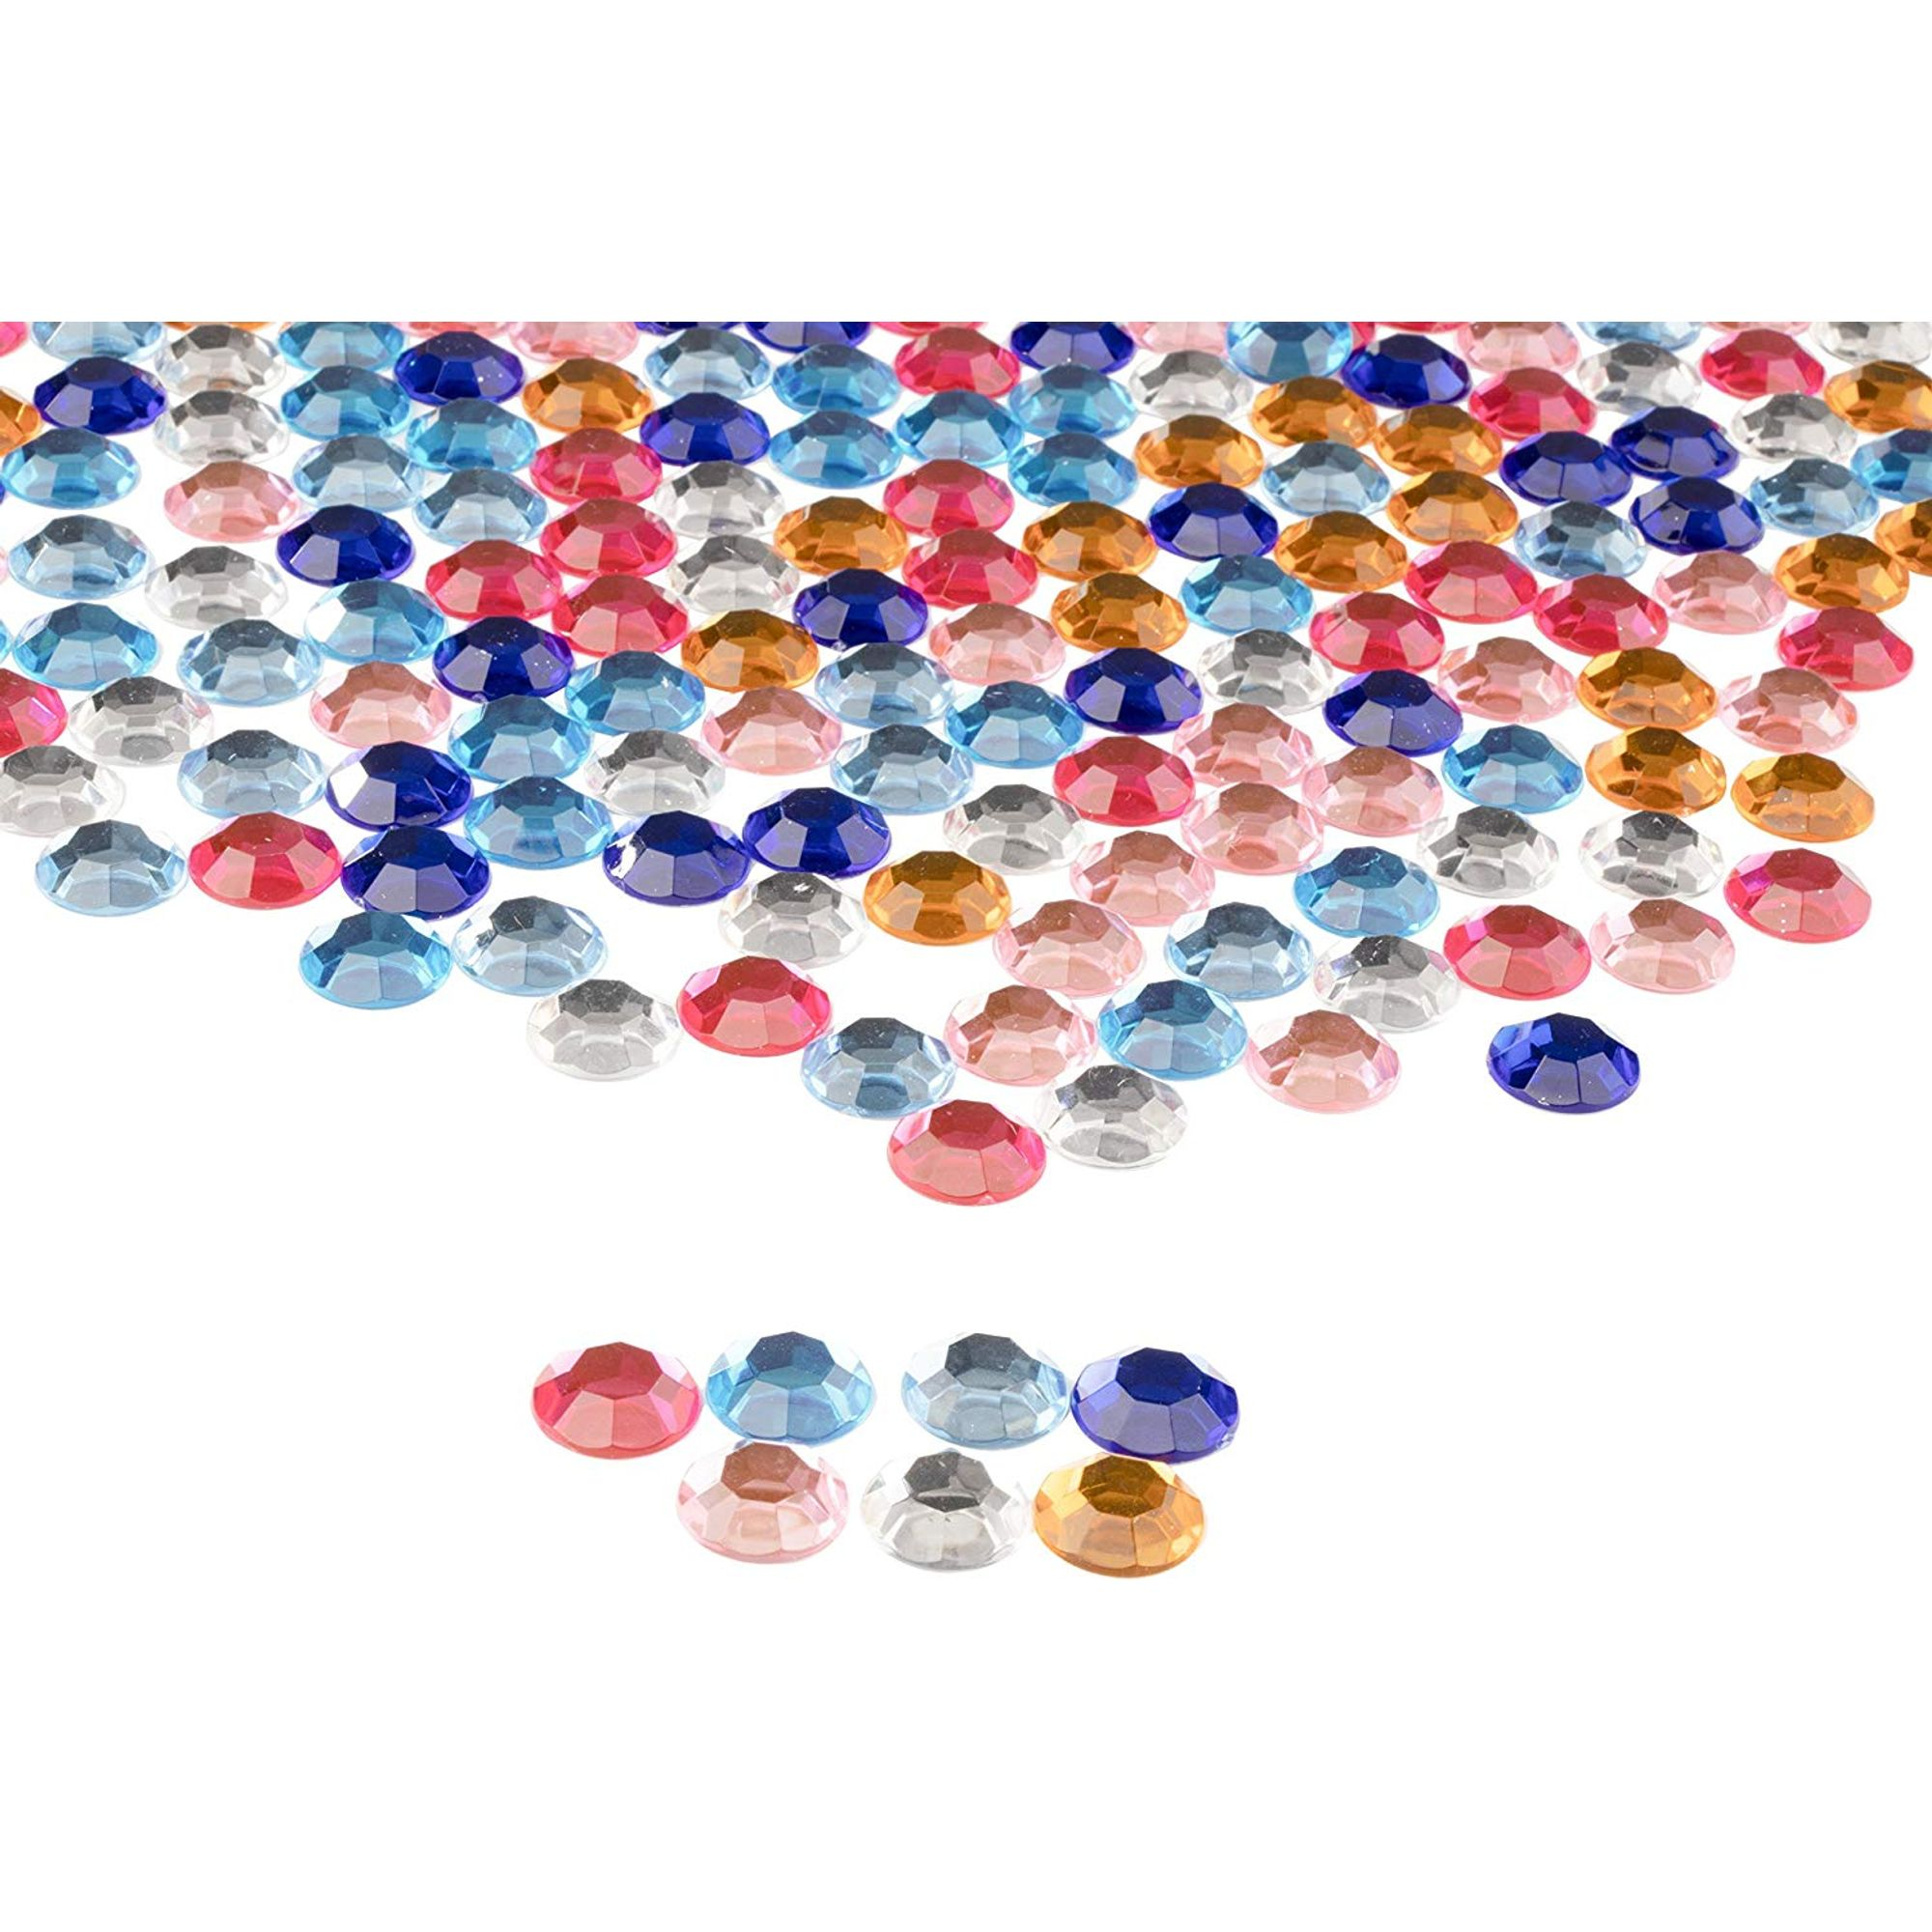 Mixed Acrylic Jewels Gemstones Card Making Crafts Embellishments Large Bag